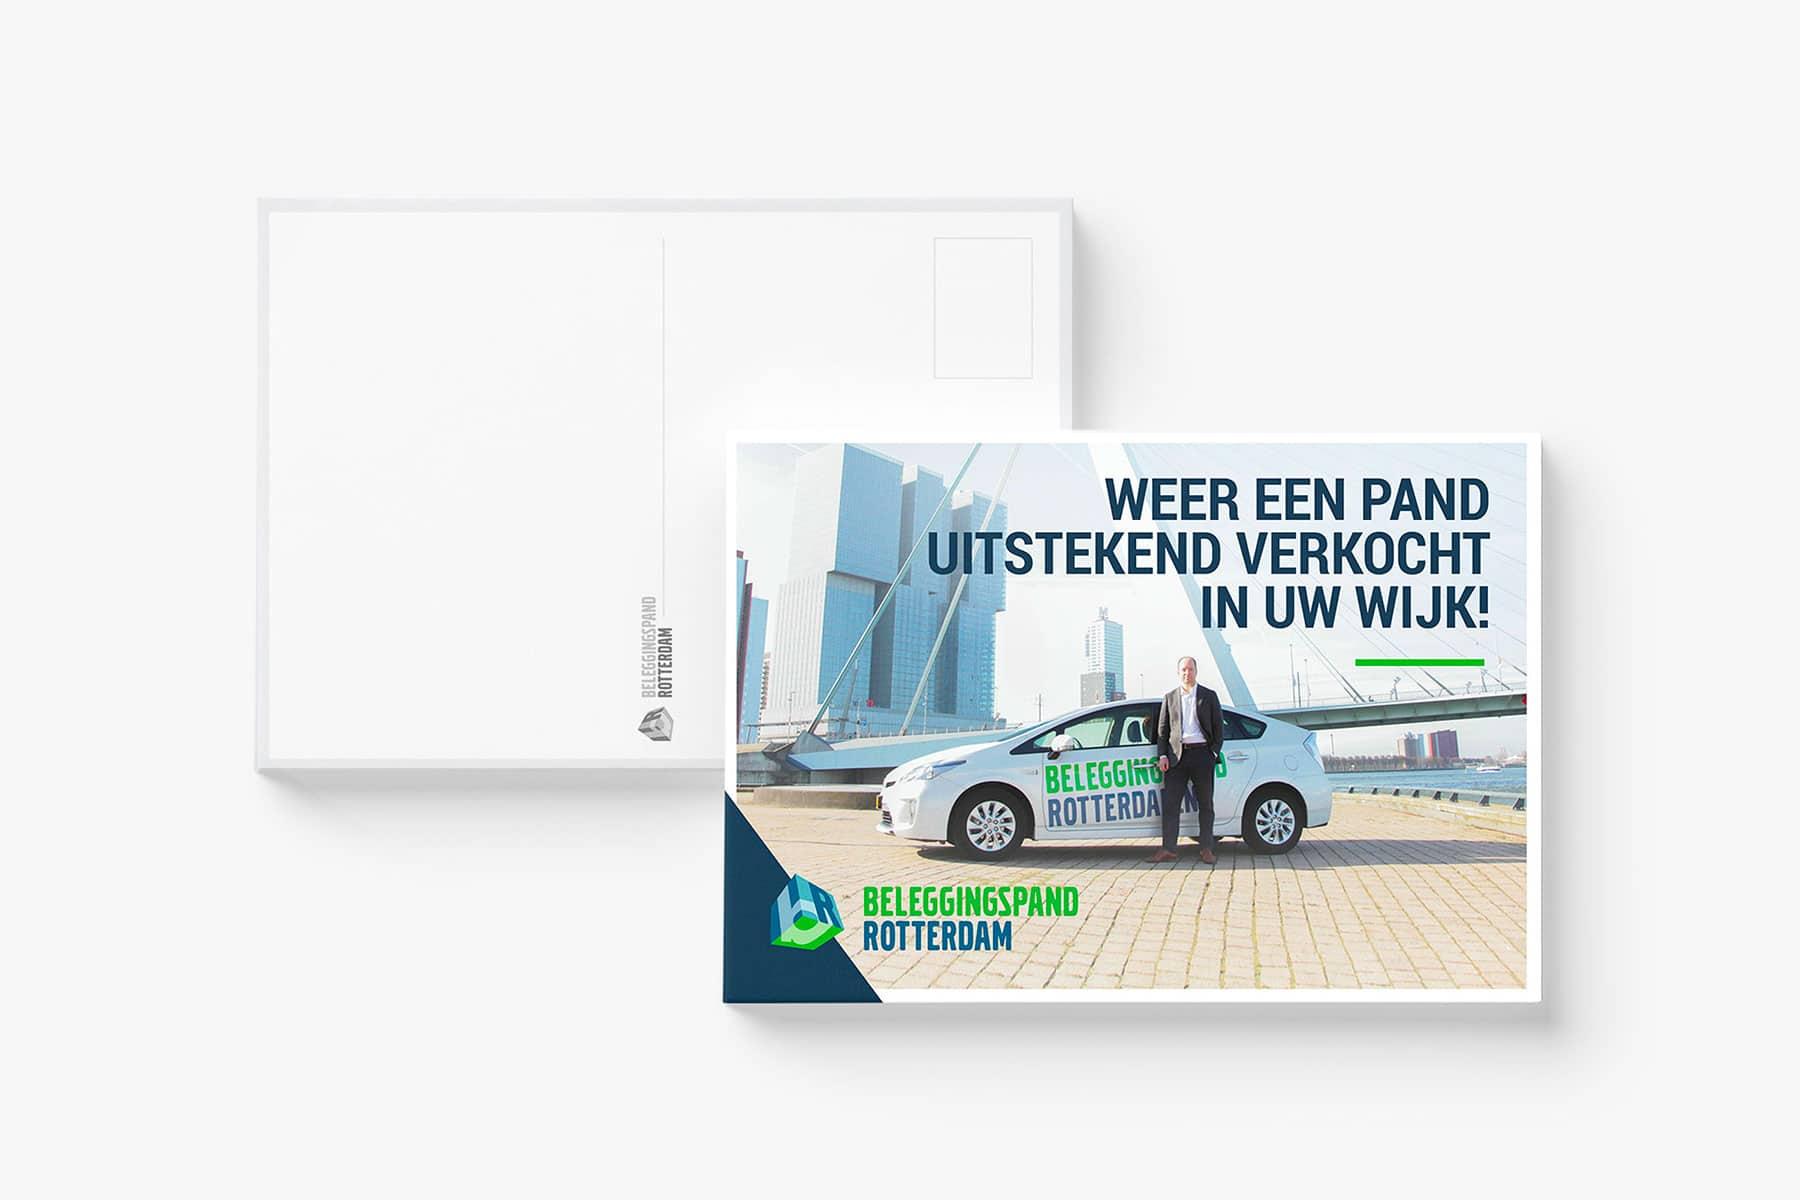 beleggingspand_rotterdam_kaart